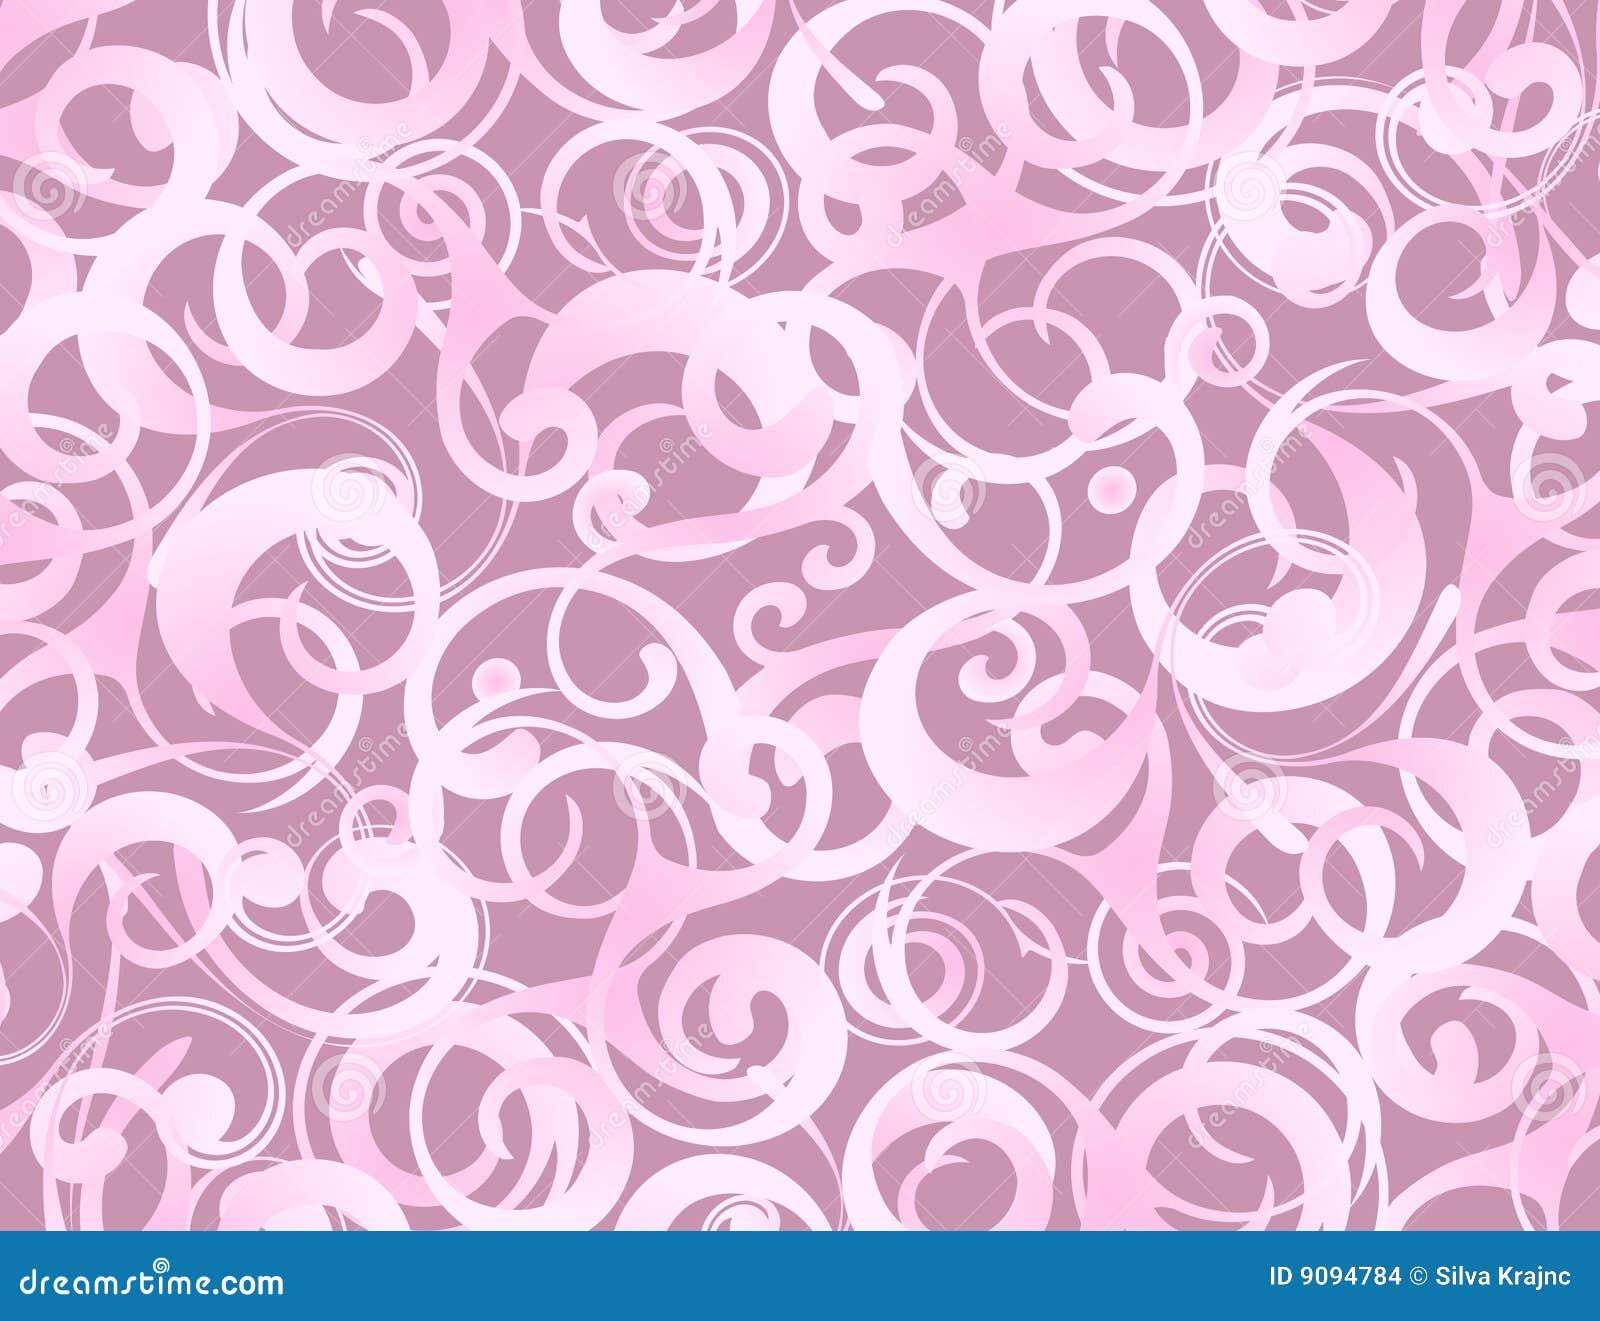 Swirly Hintergrundvektor